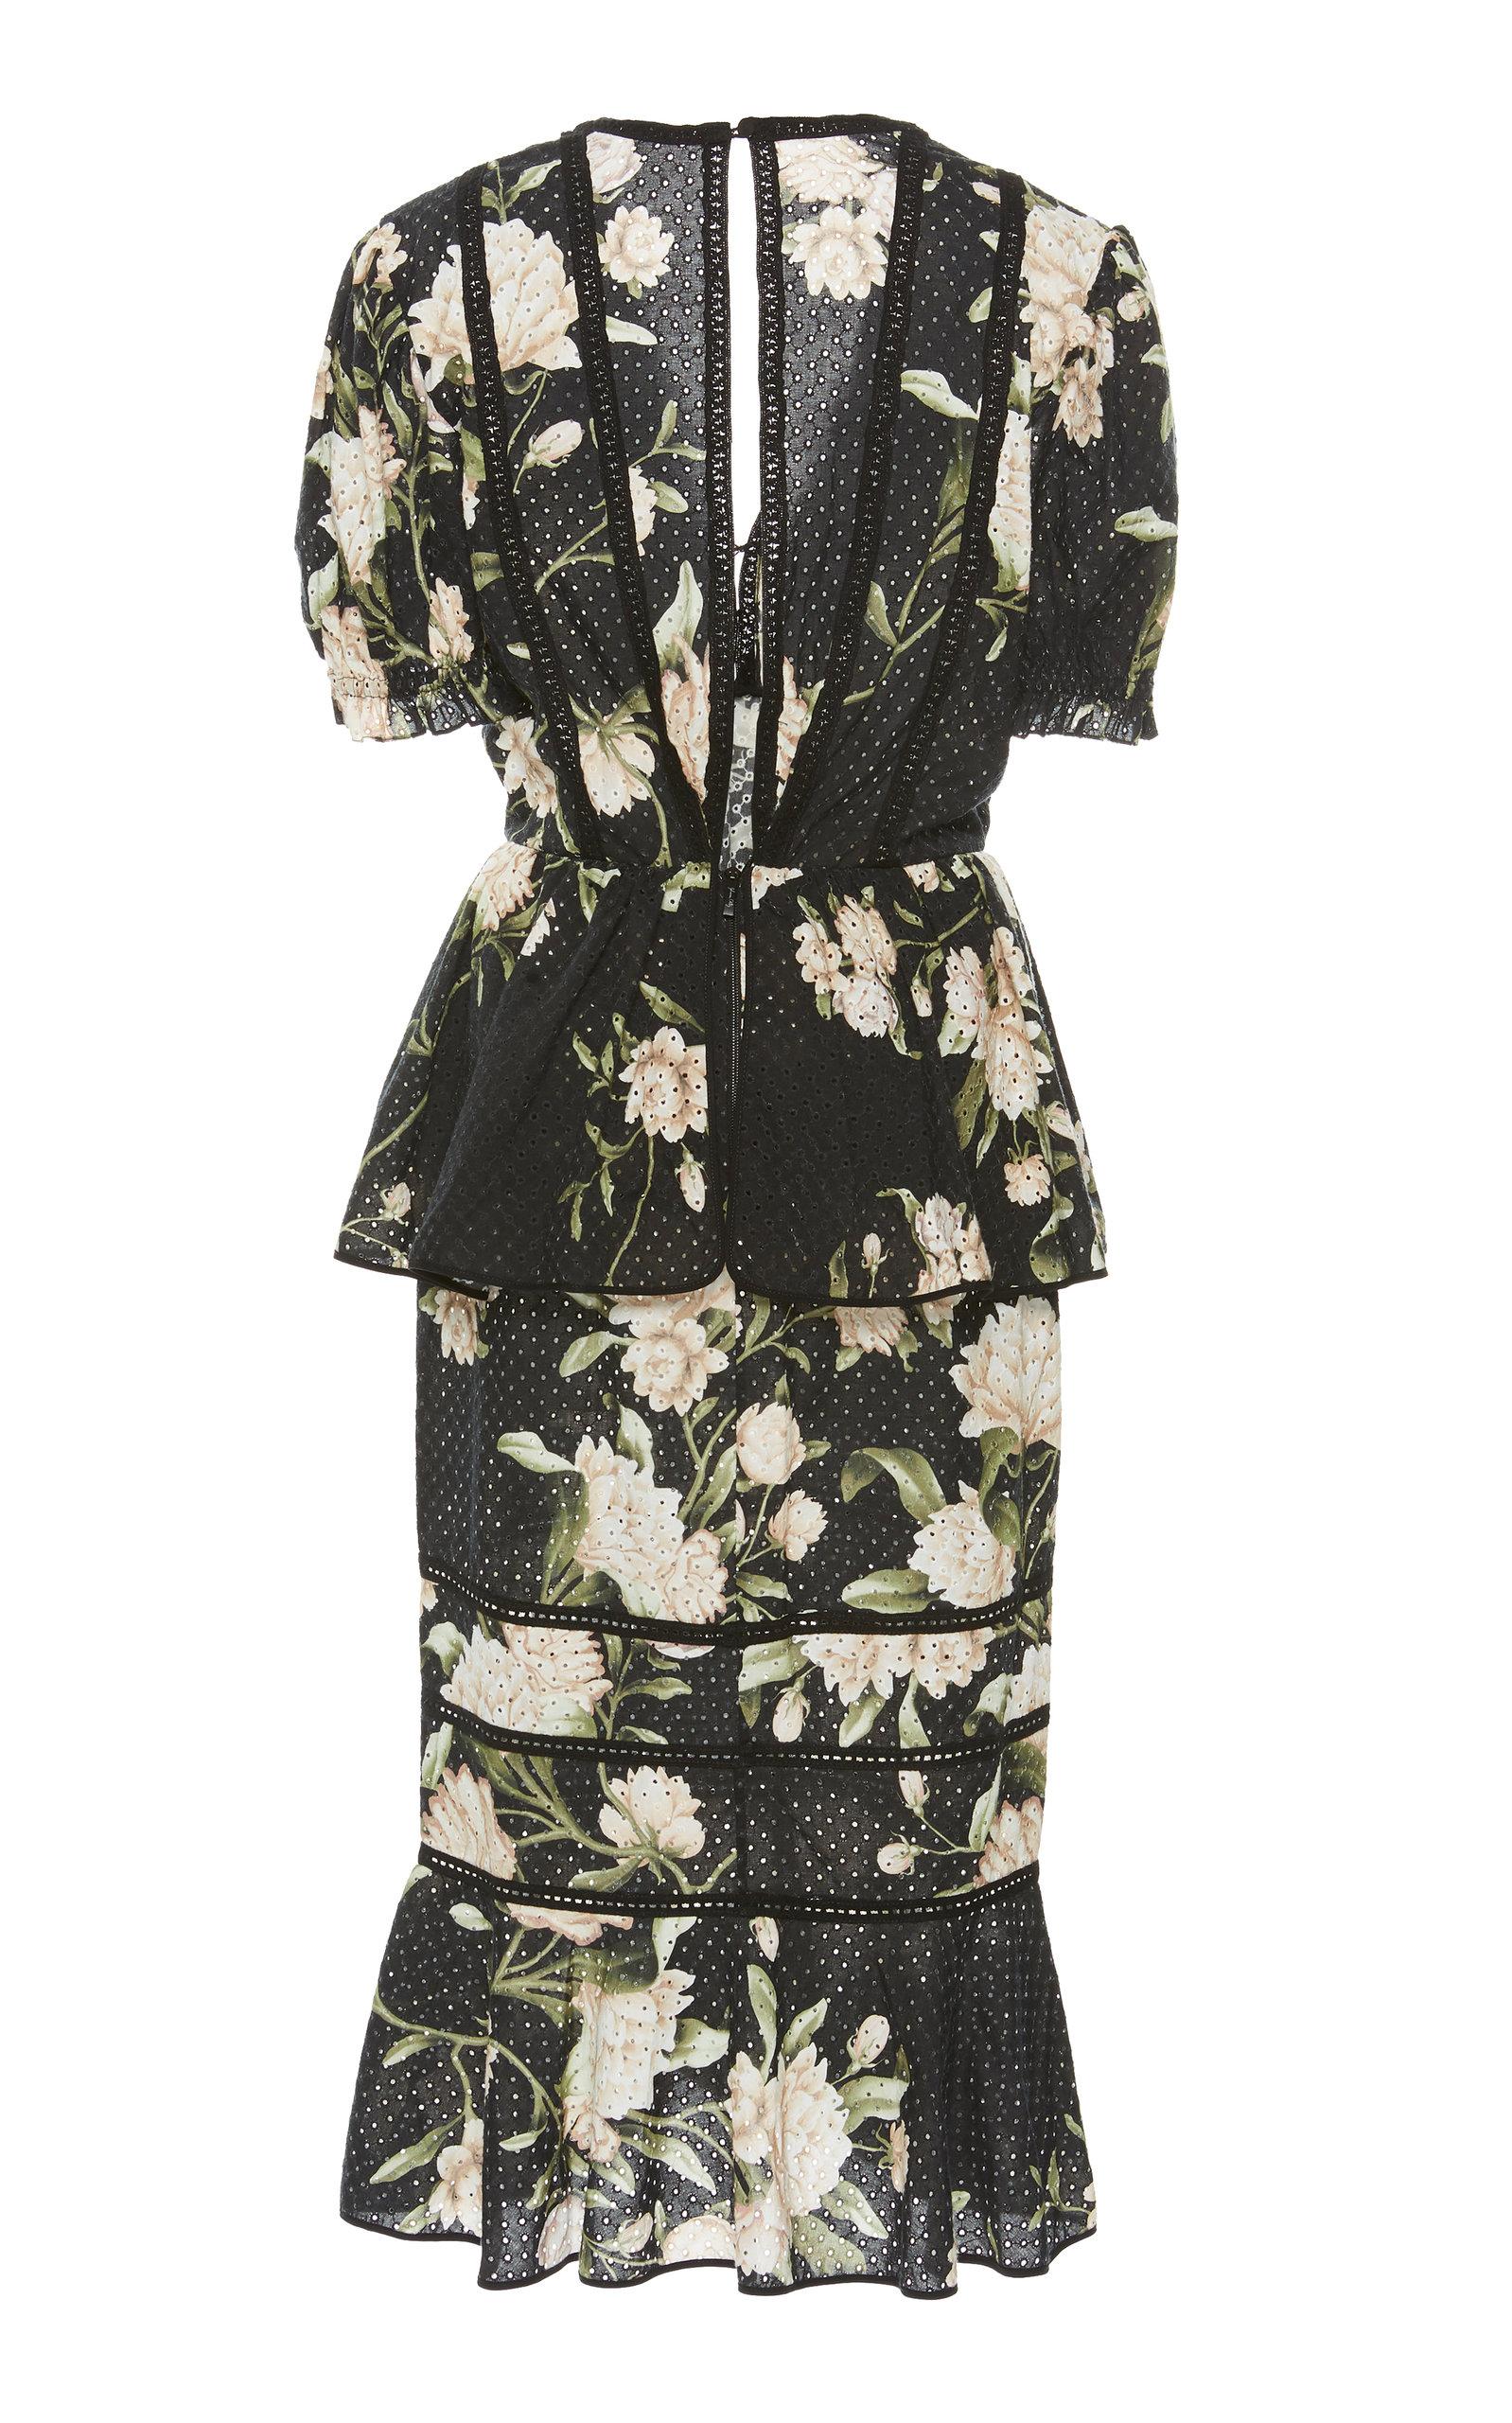 1c94aa74c6f Johanna OrtizOriental State Floral Cotton Eyelet Dress. CLOSE. Loading.  Loading. Loading